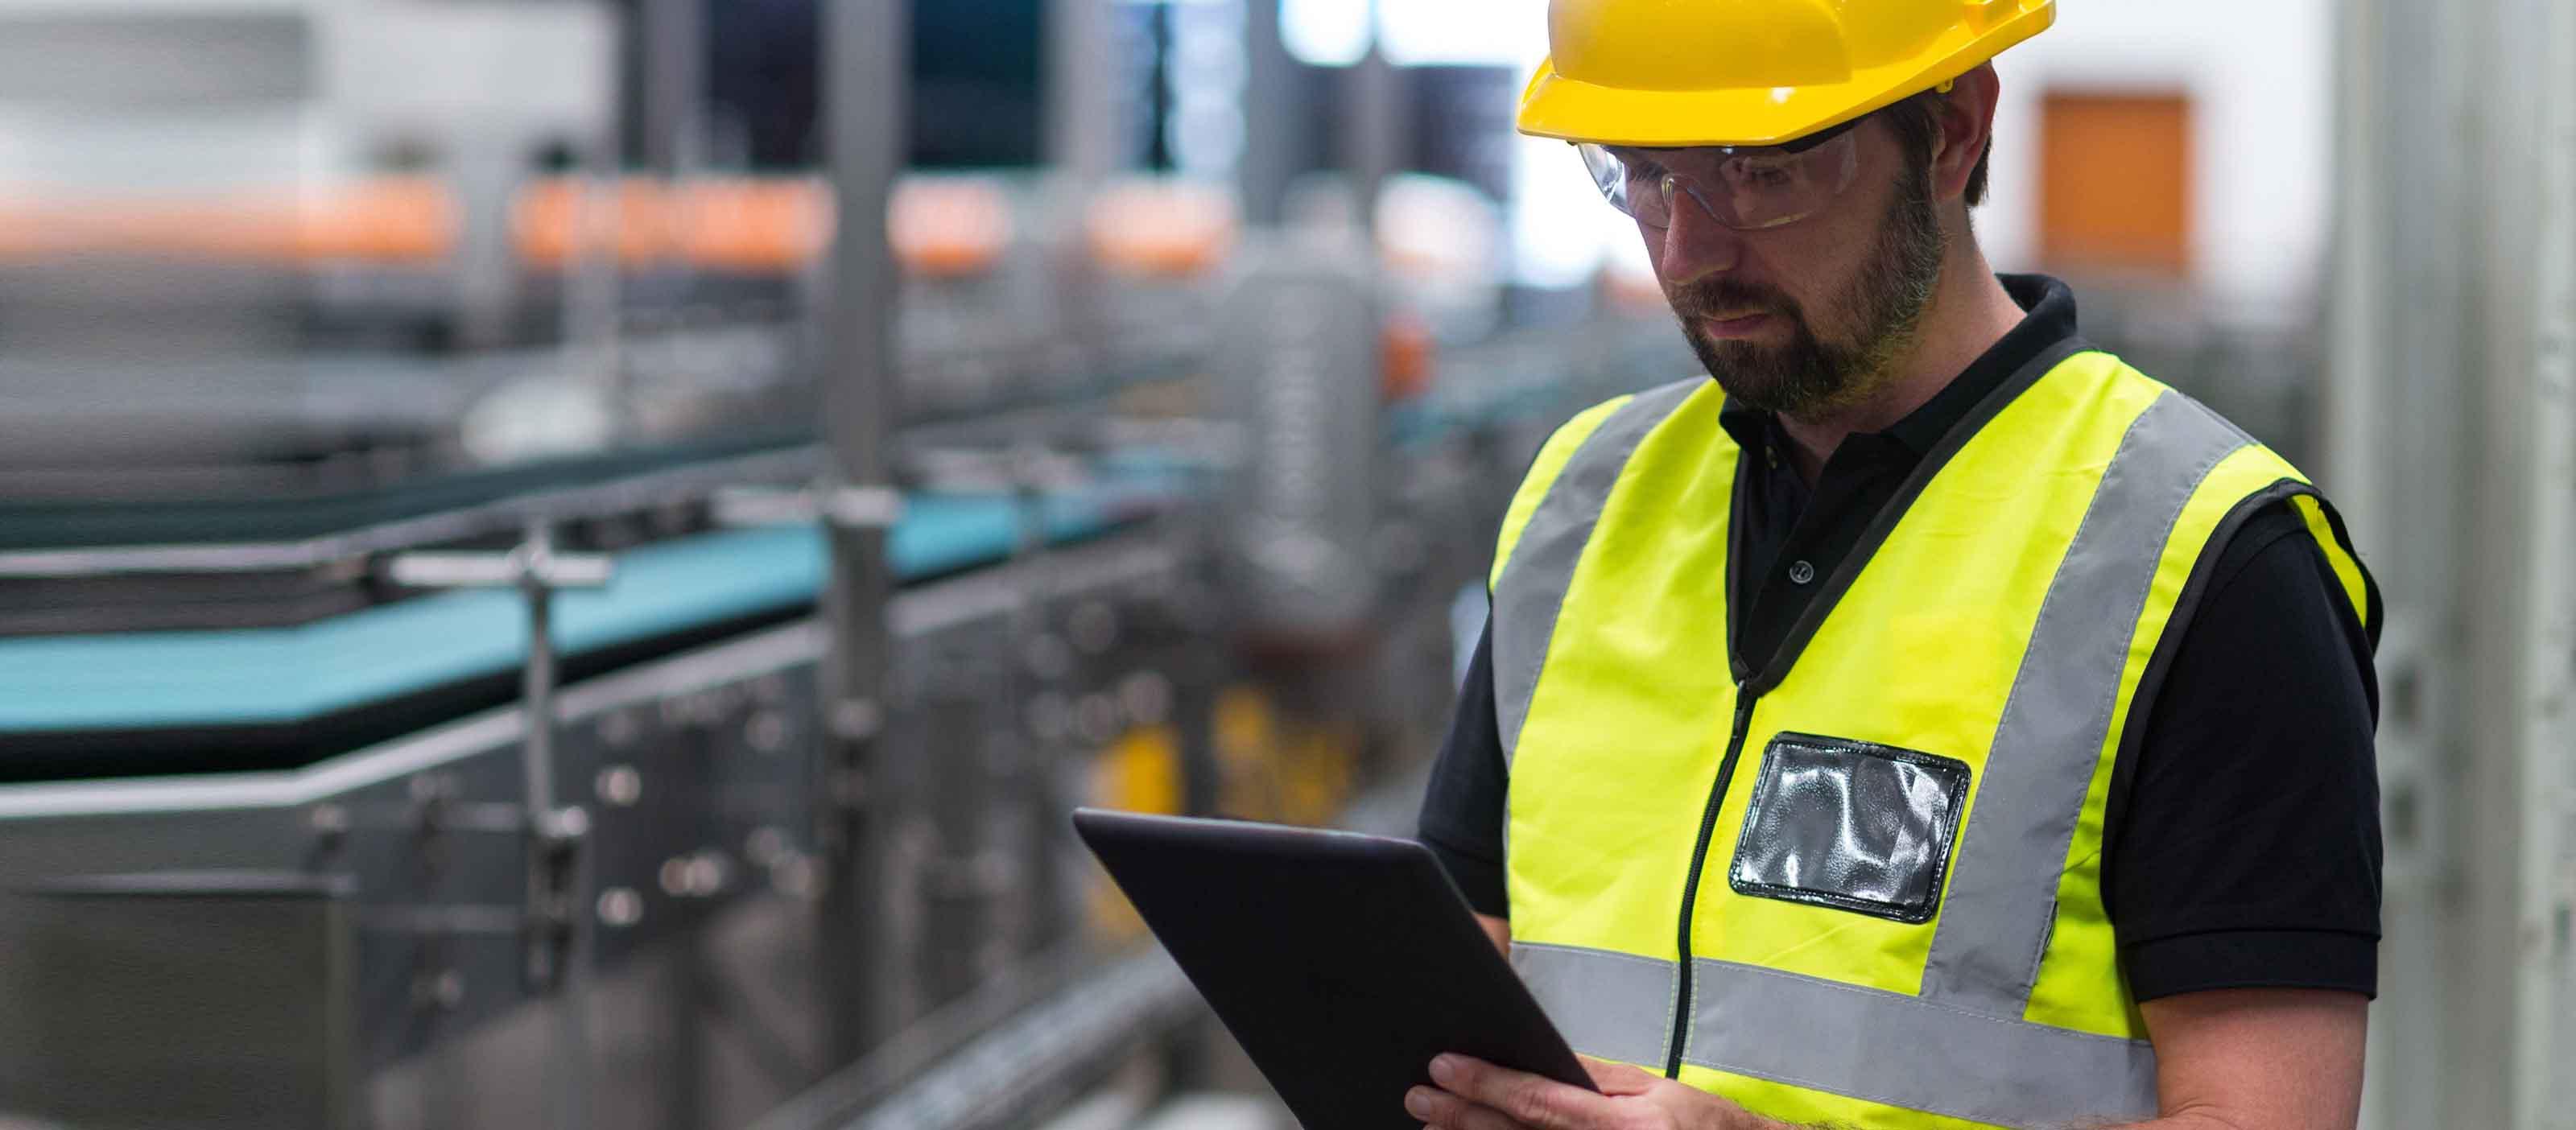 GE Digital software for manufacturing plant operators